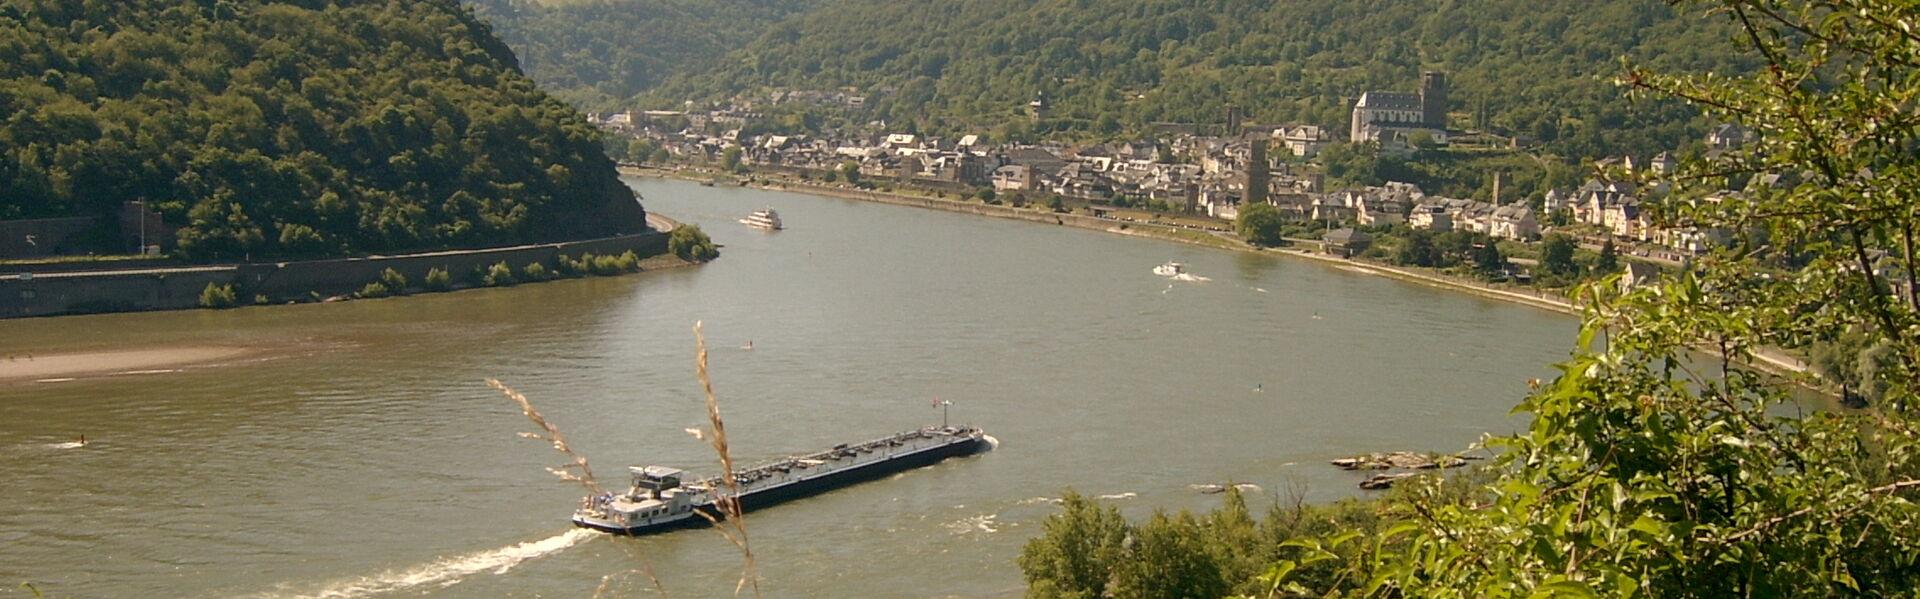 Rhein_bei_Oberwesel